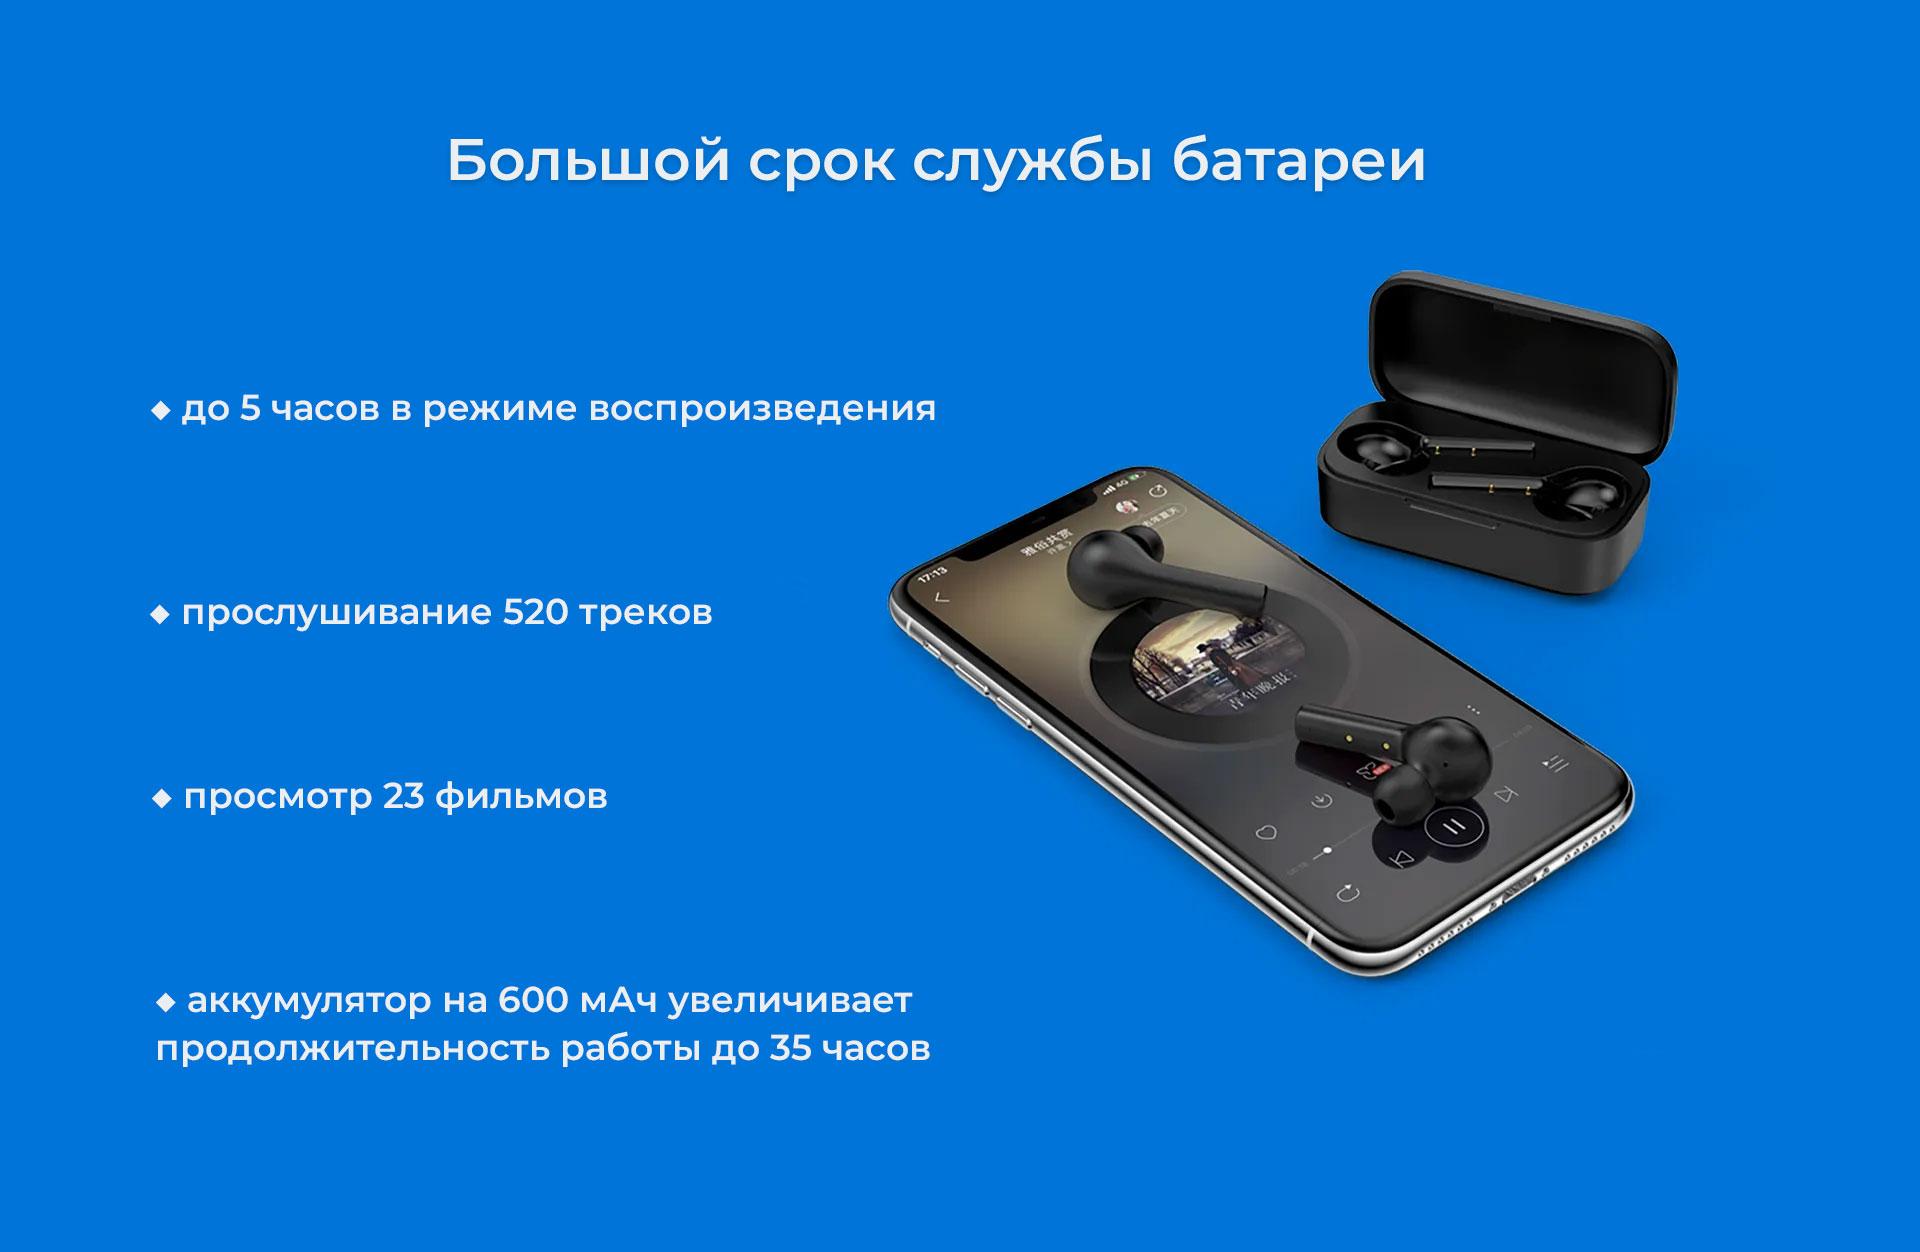 Opisanie Besprovodnye Naushniki Xiaomi Qcy T5s 03